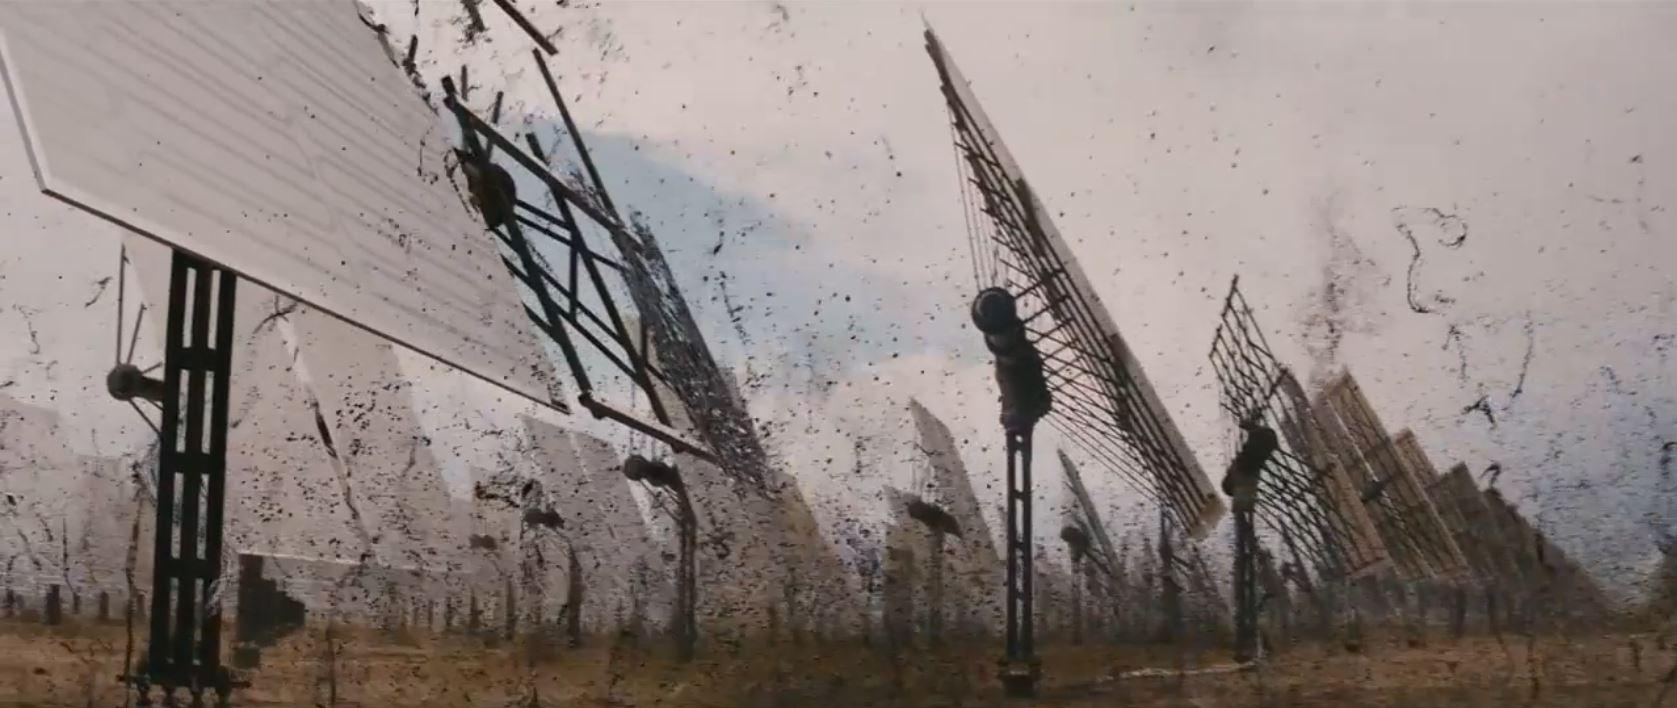 transcendence movie - The machine taking over matter